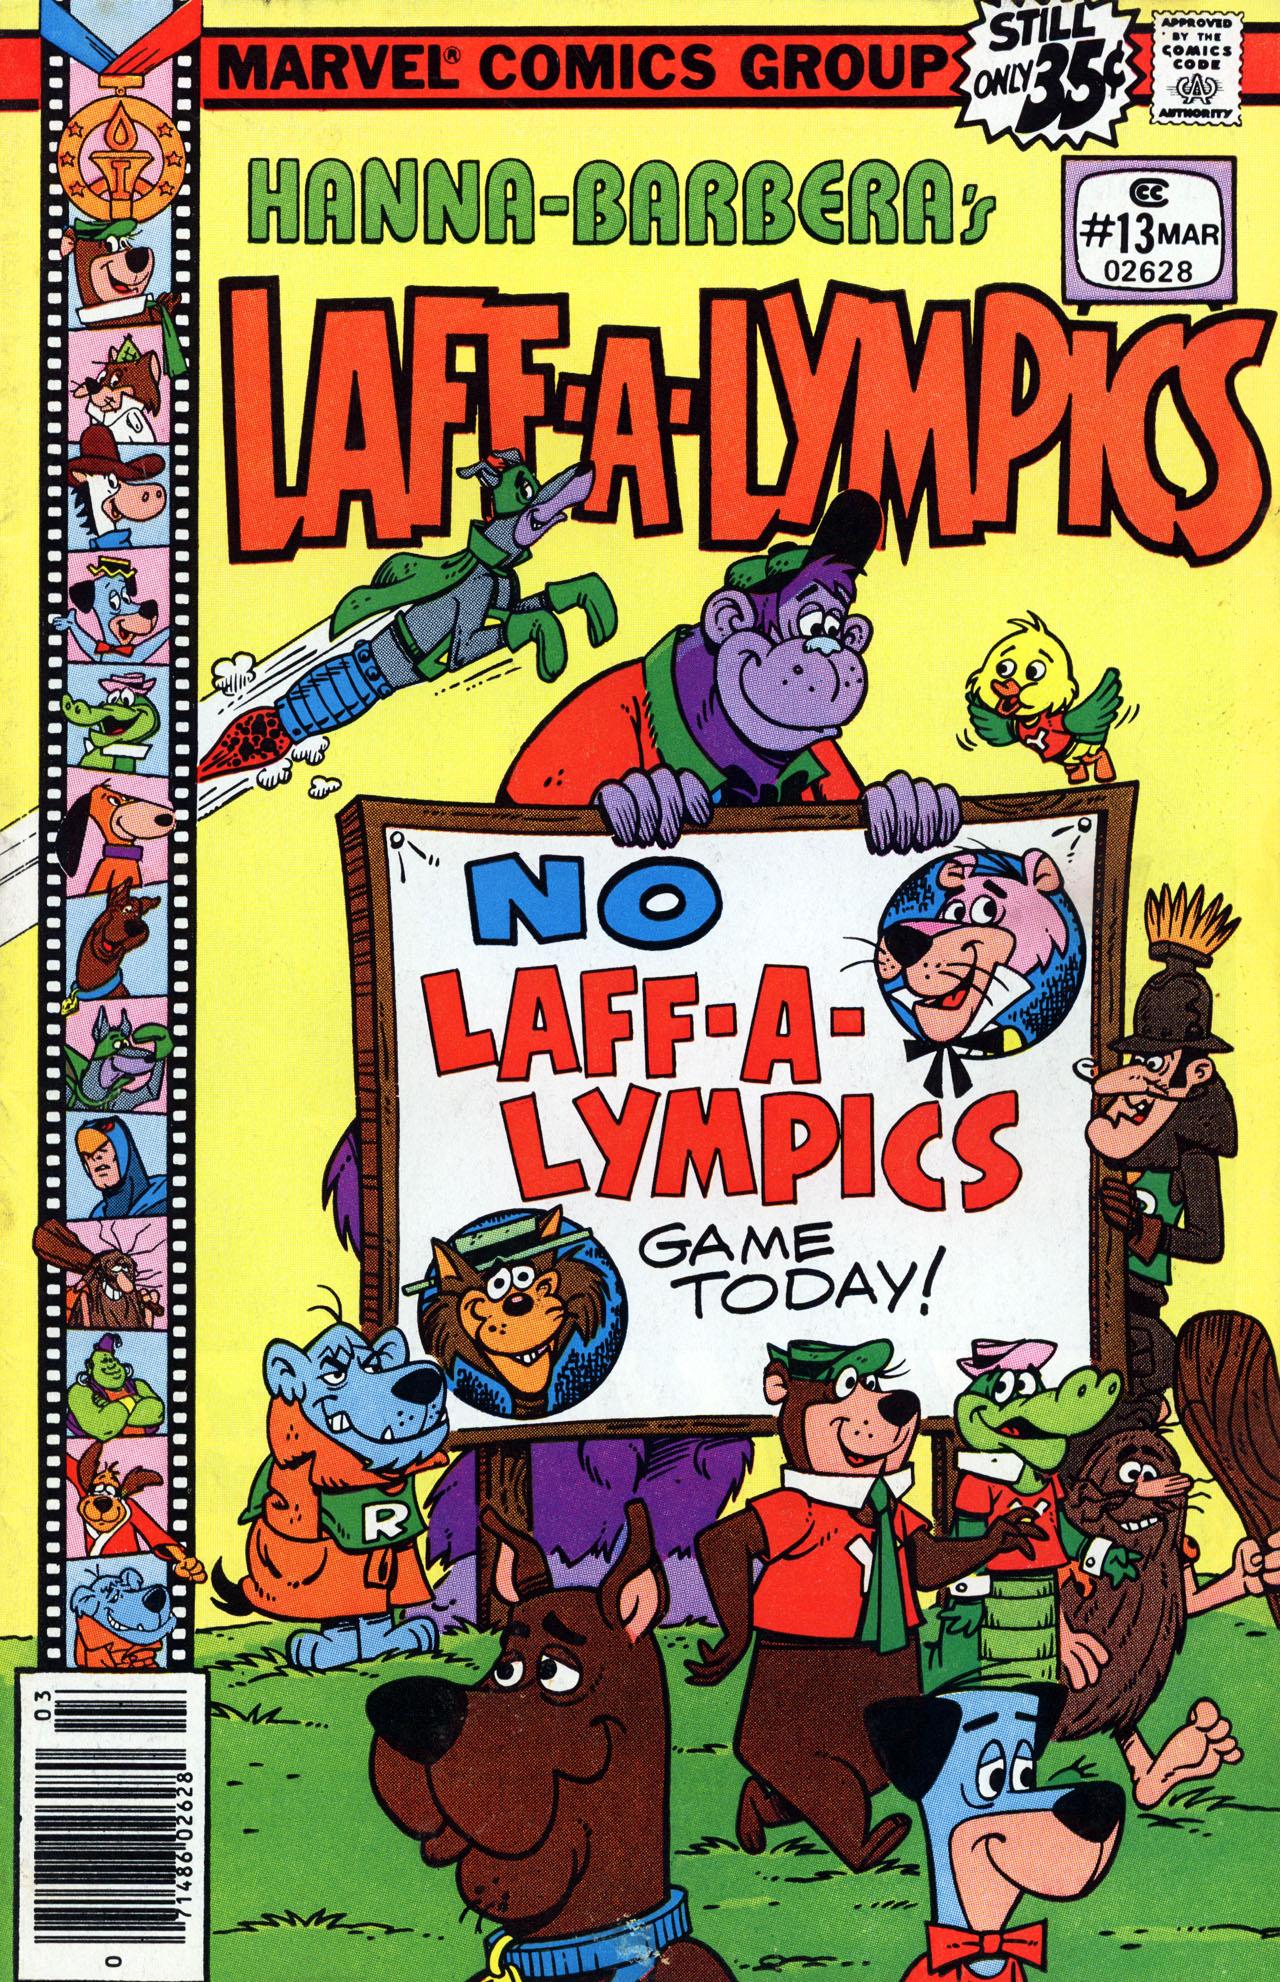 Laff-a-lympics 13 Page 1